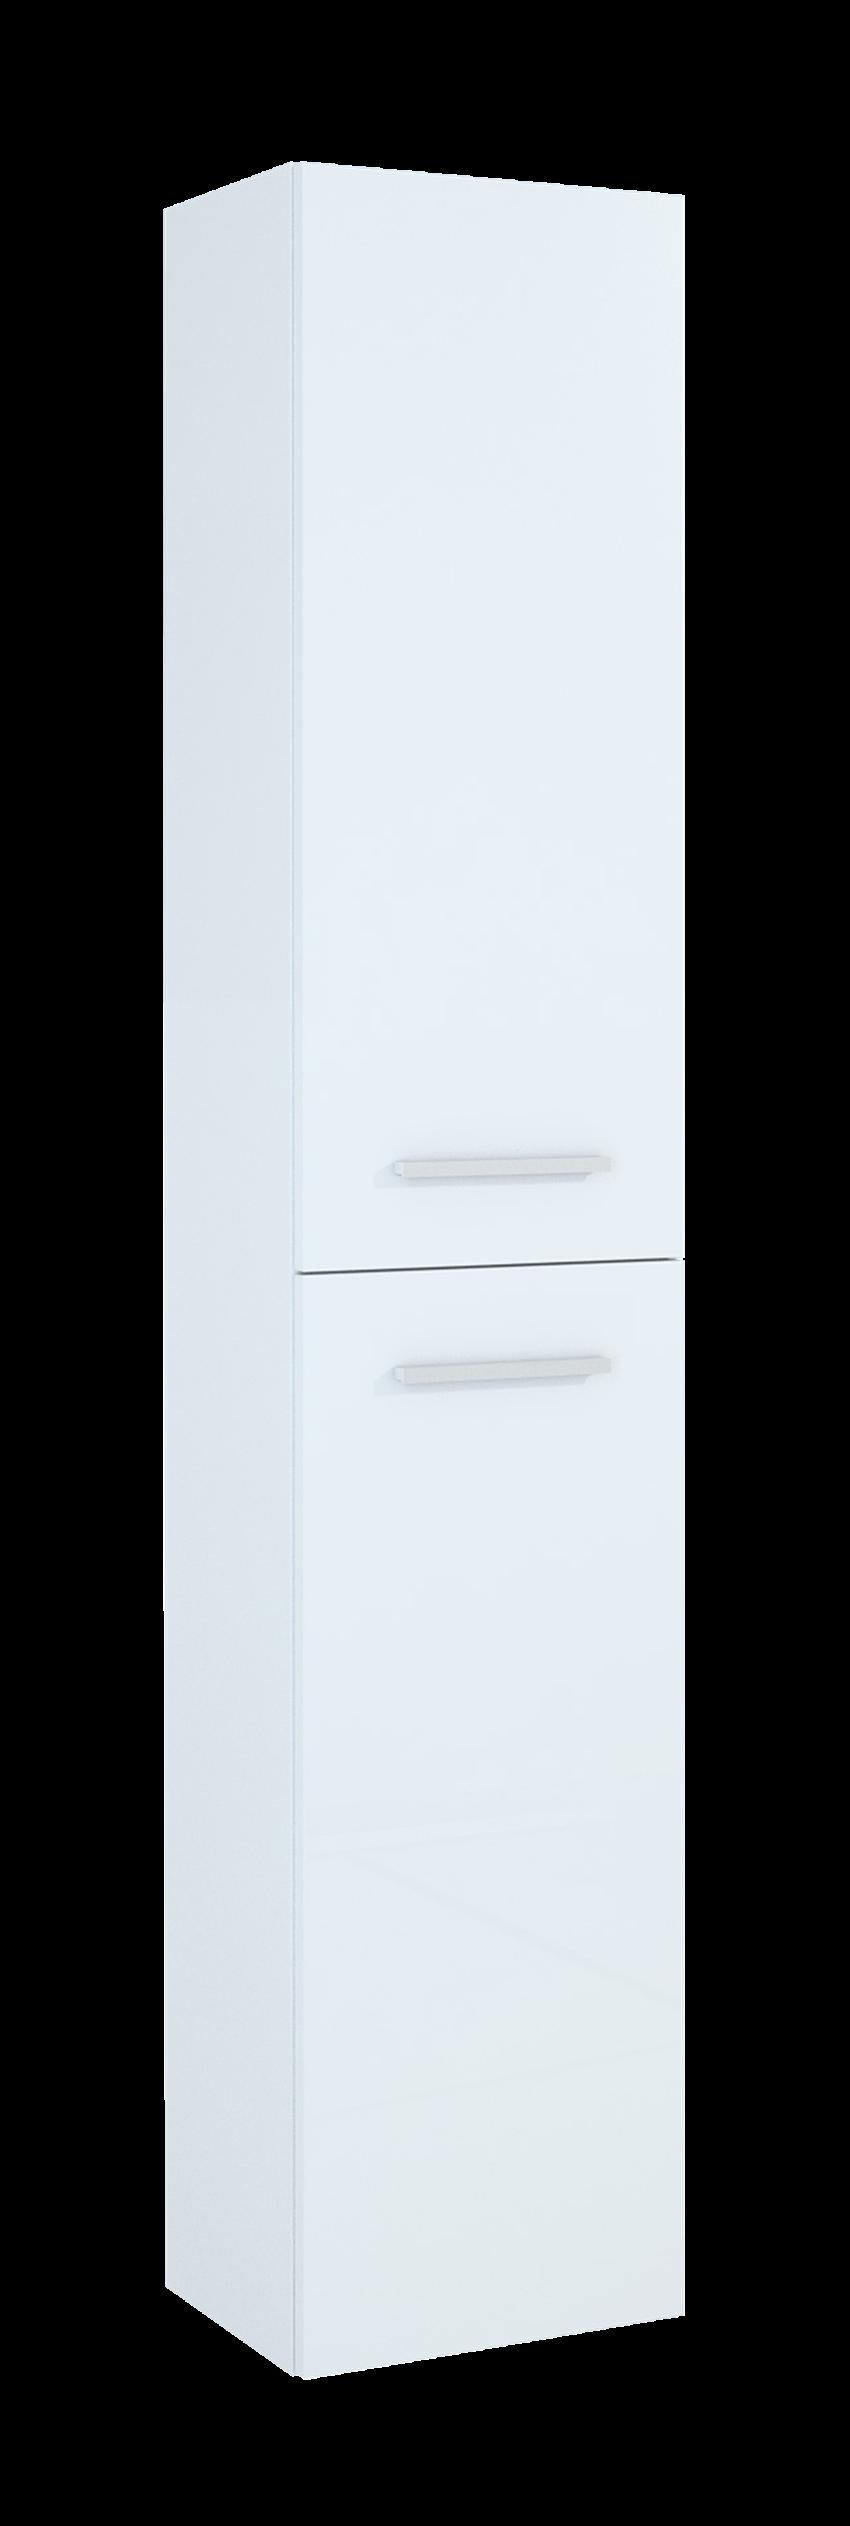 Słupek biały szafki 30 cm Elita Kwadro Plus